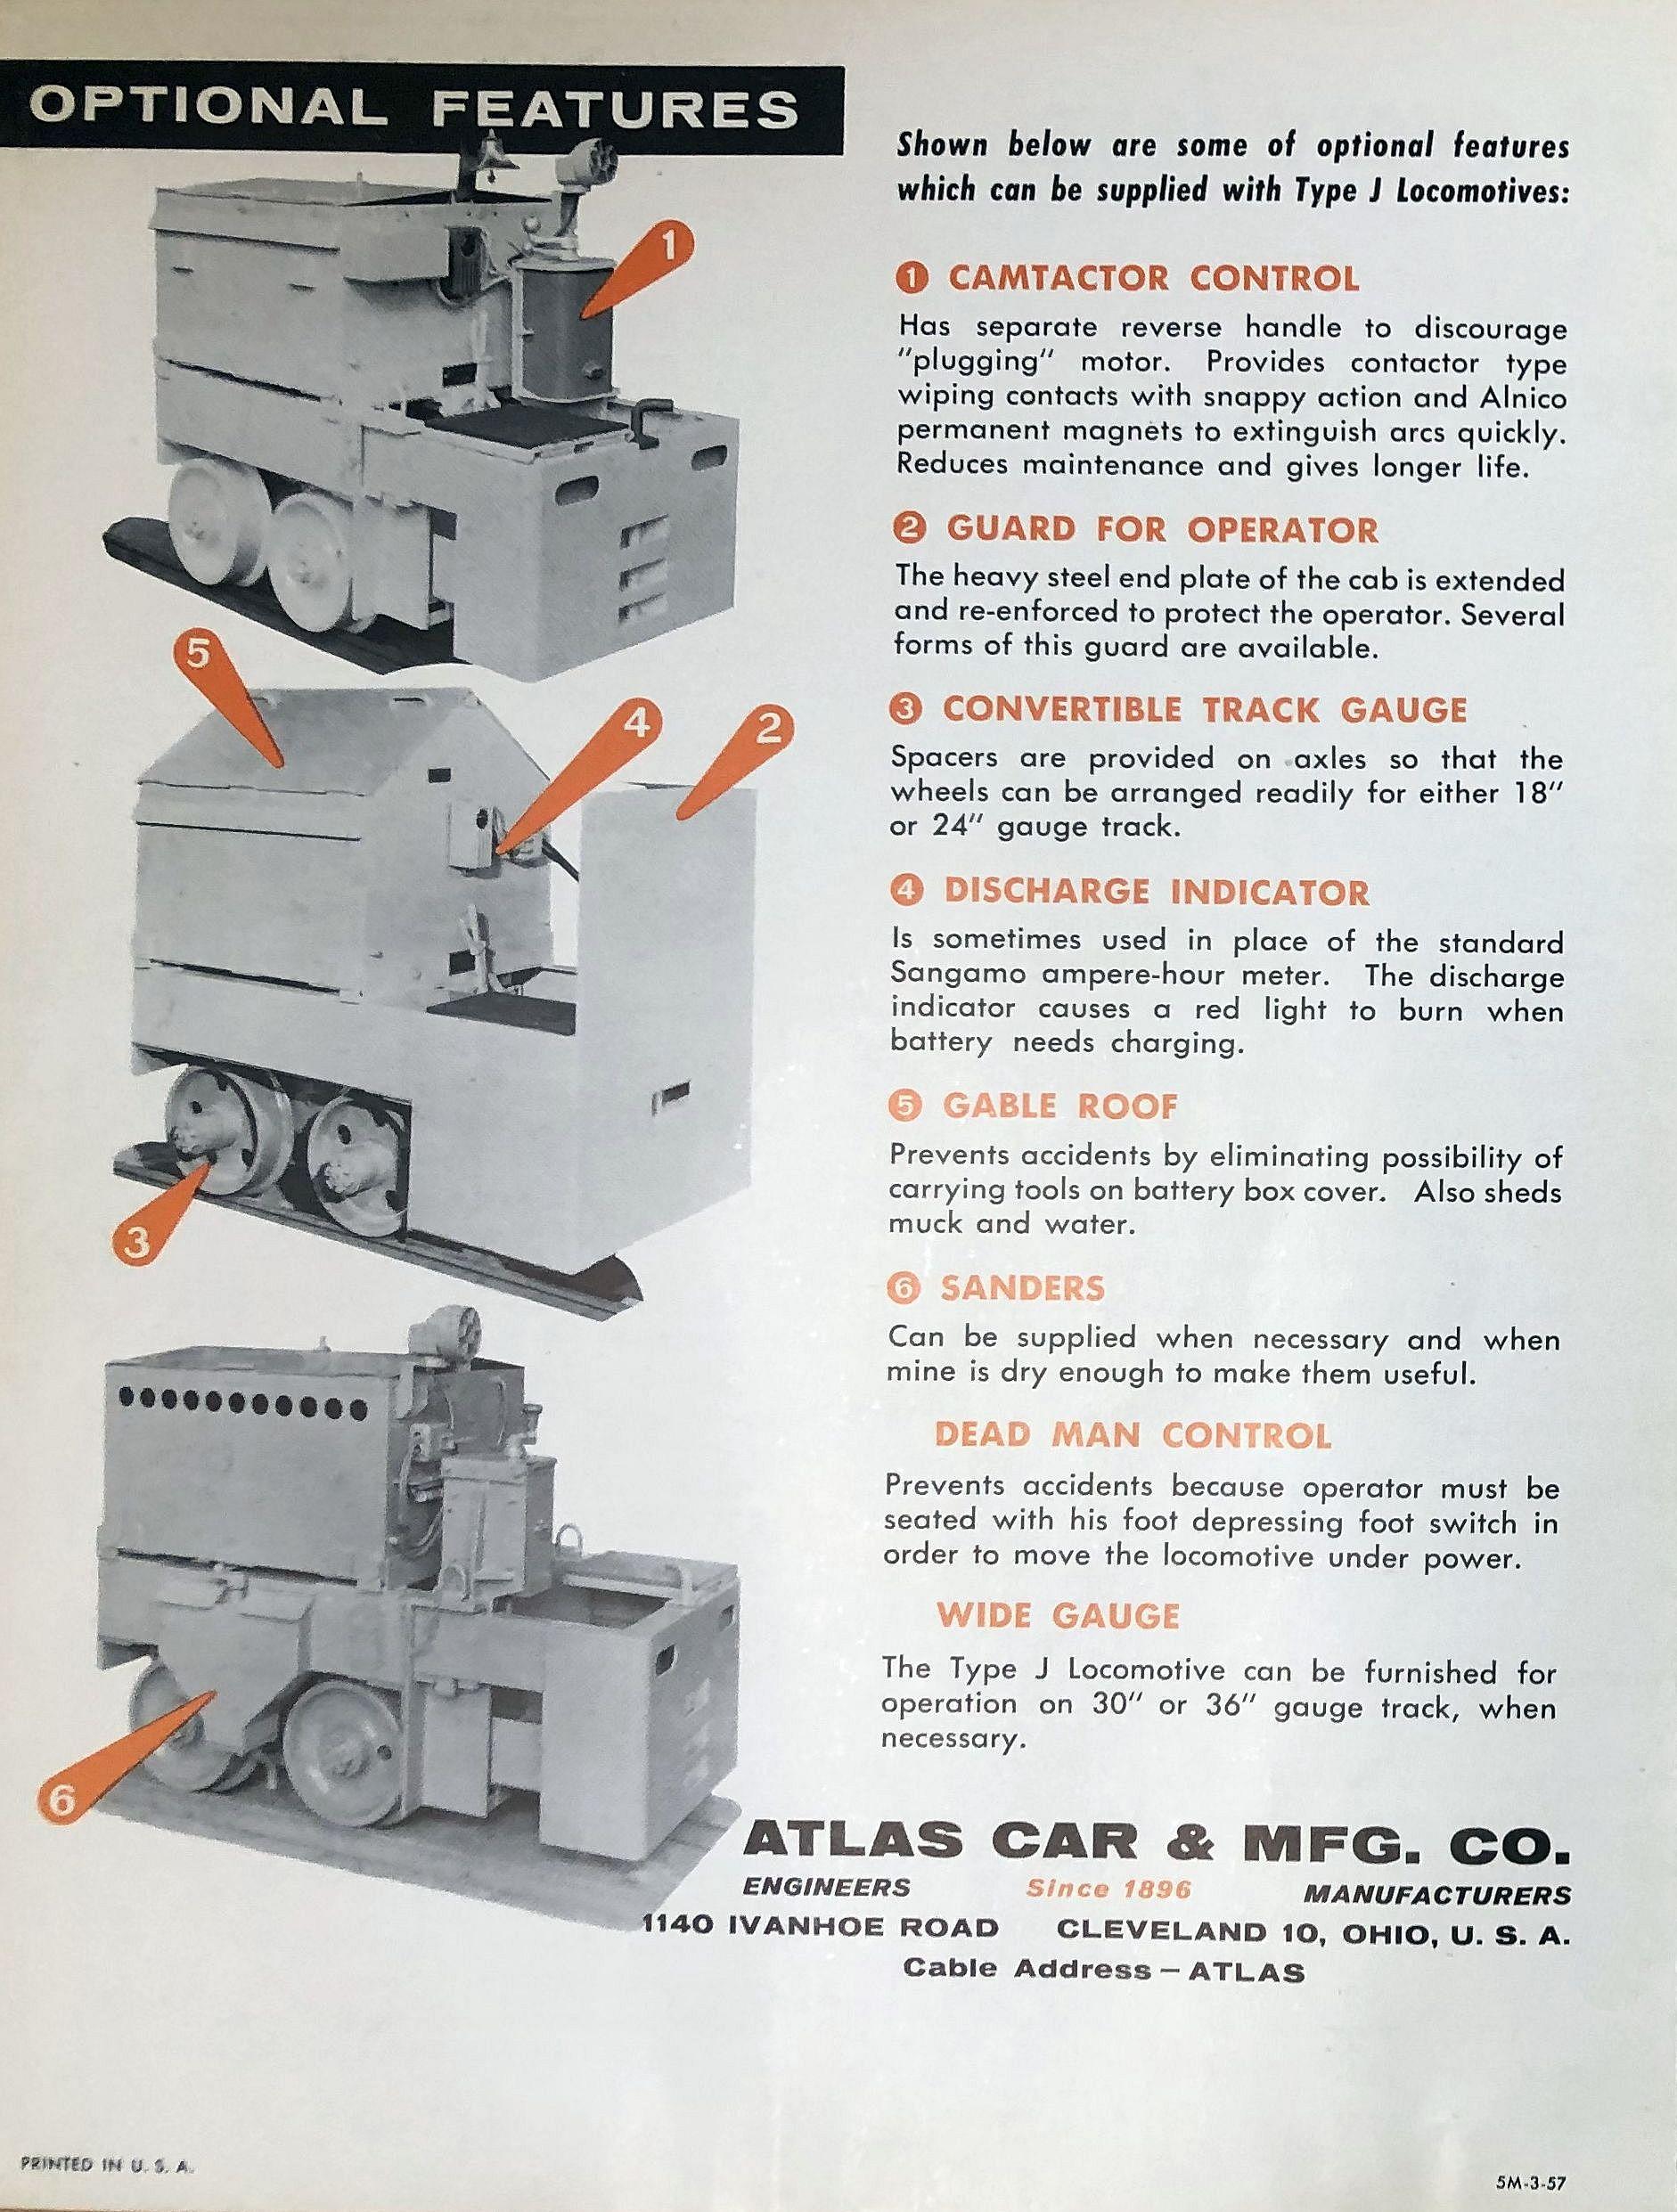 Atlas Type J Locomotive - 3